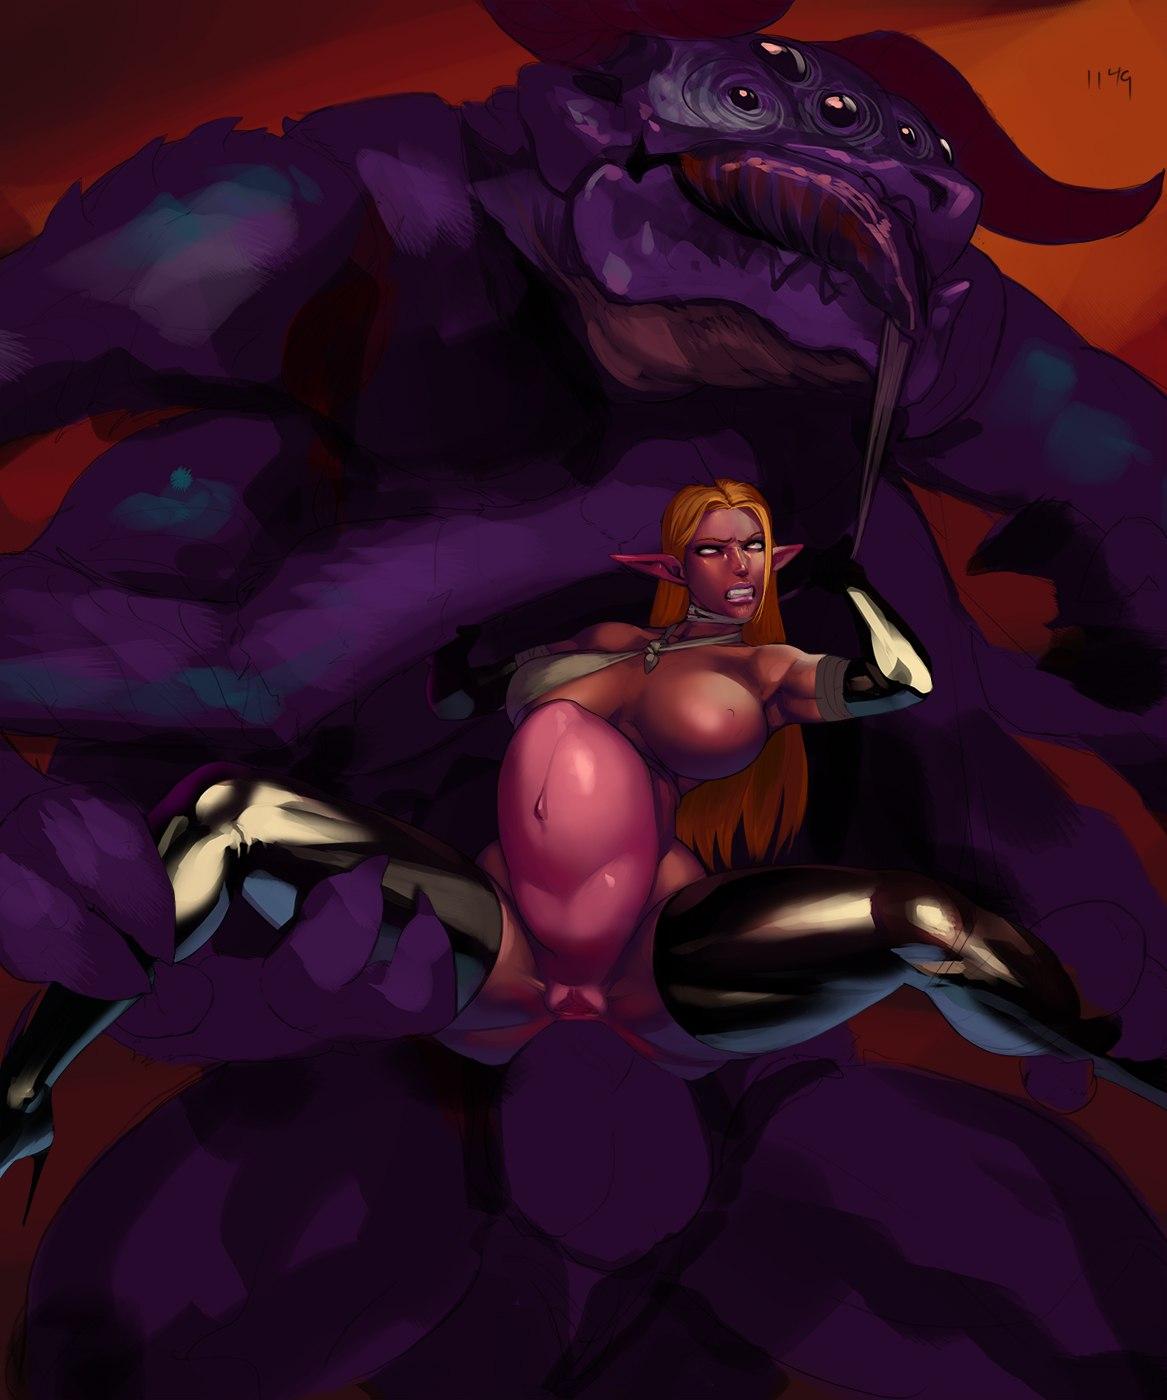 queen demon webtoon and mage Madan no au to vanadis